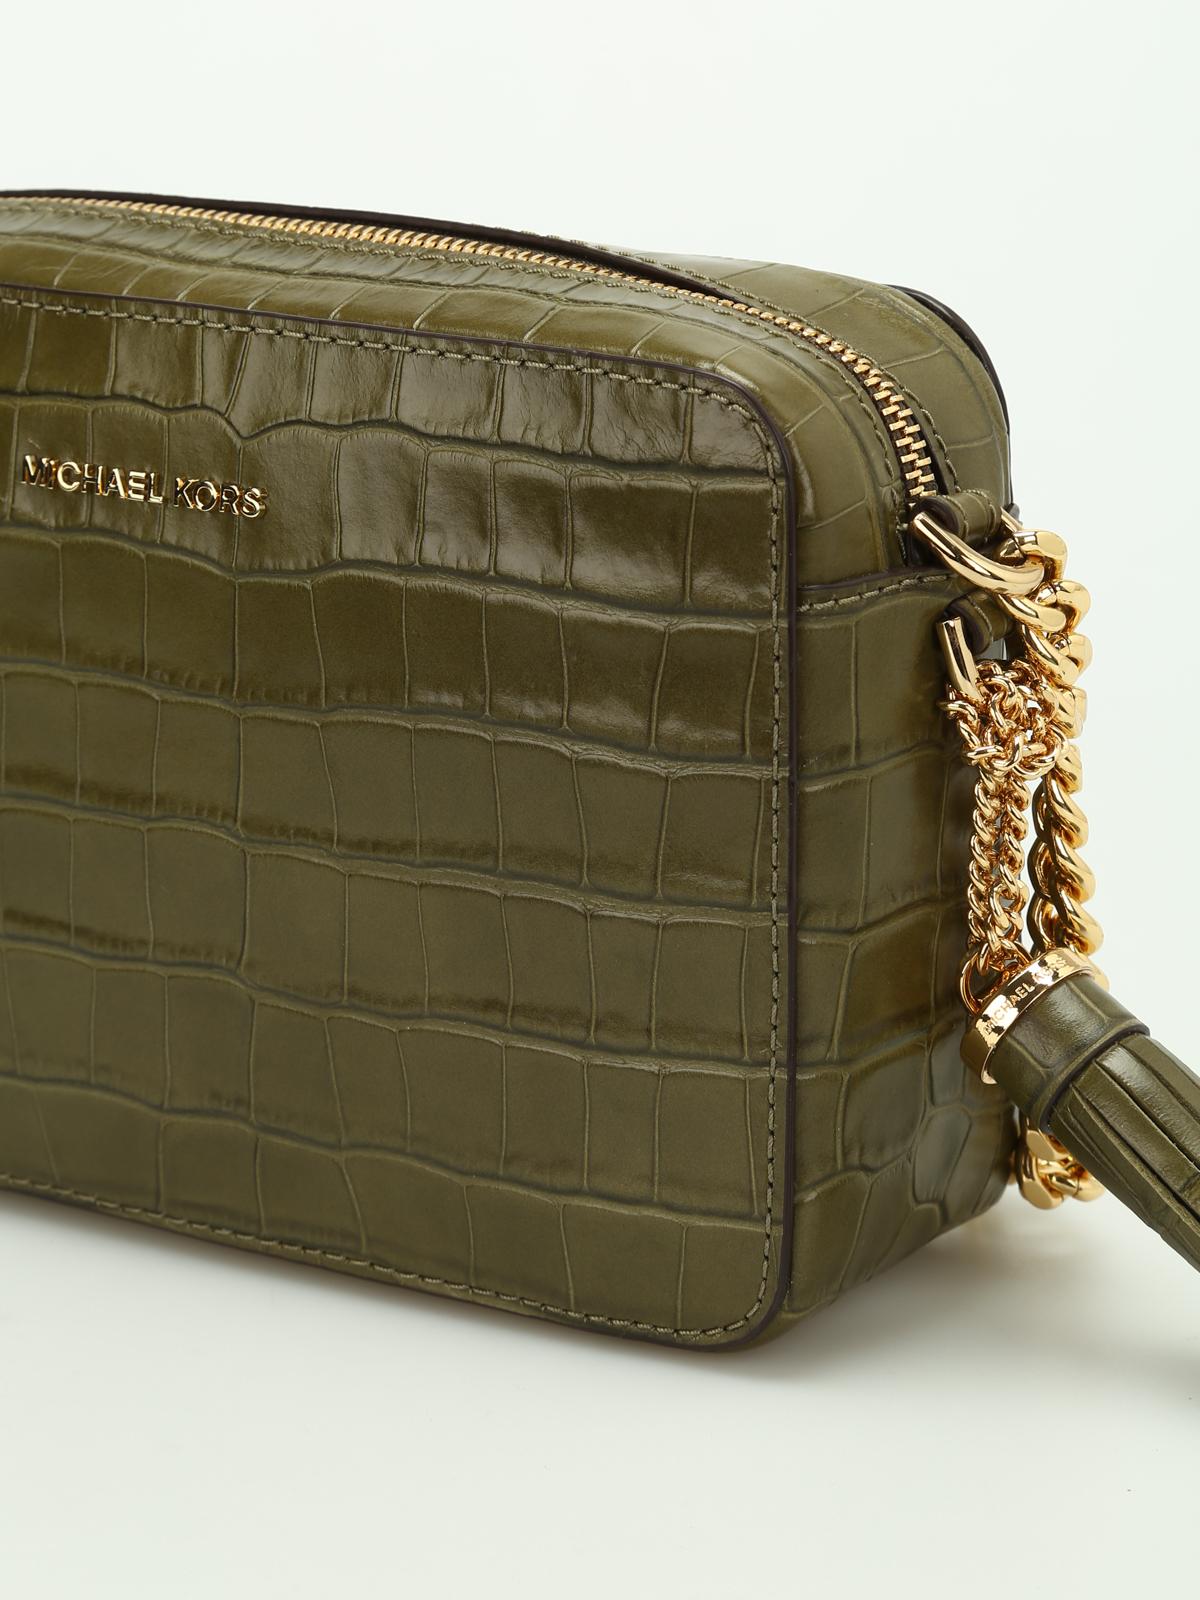 6158b19ee65b iKRIX MICHAEL KORS  cross body bags - Ginny embossed leather camera bag.  Ginny embossed leather camera bag shop online  MICHAEL KORS